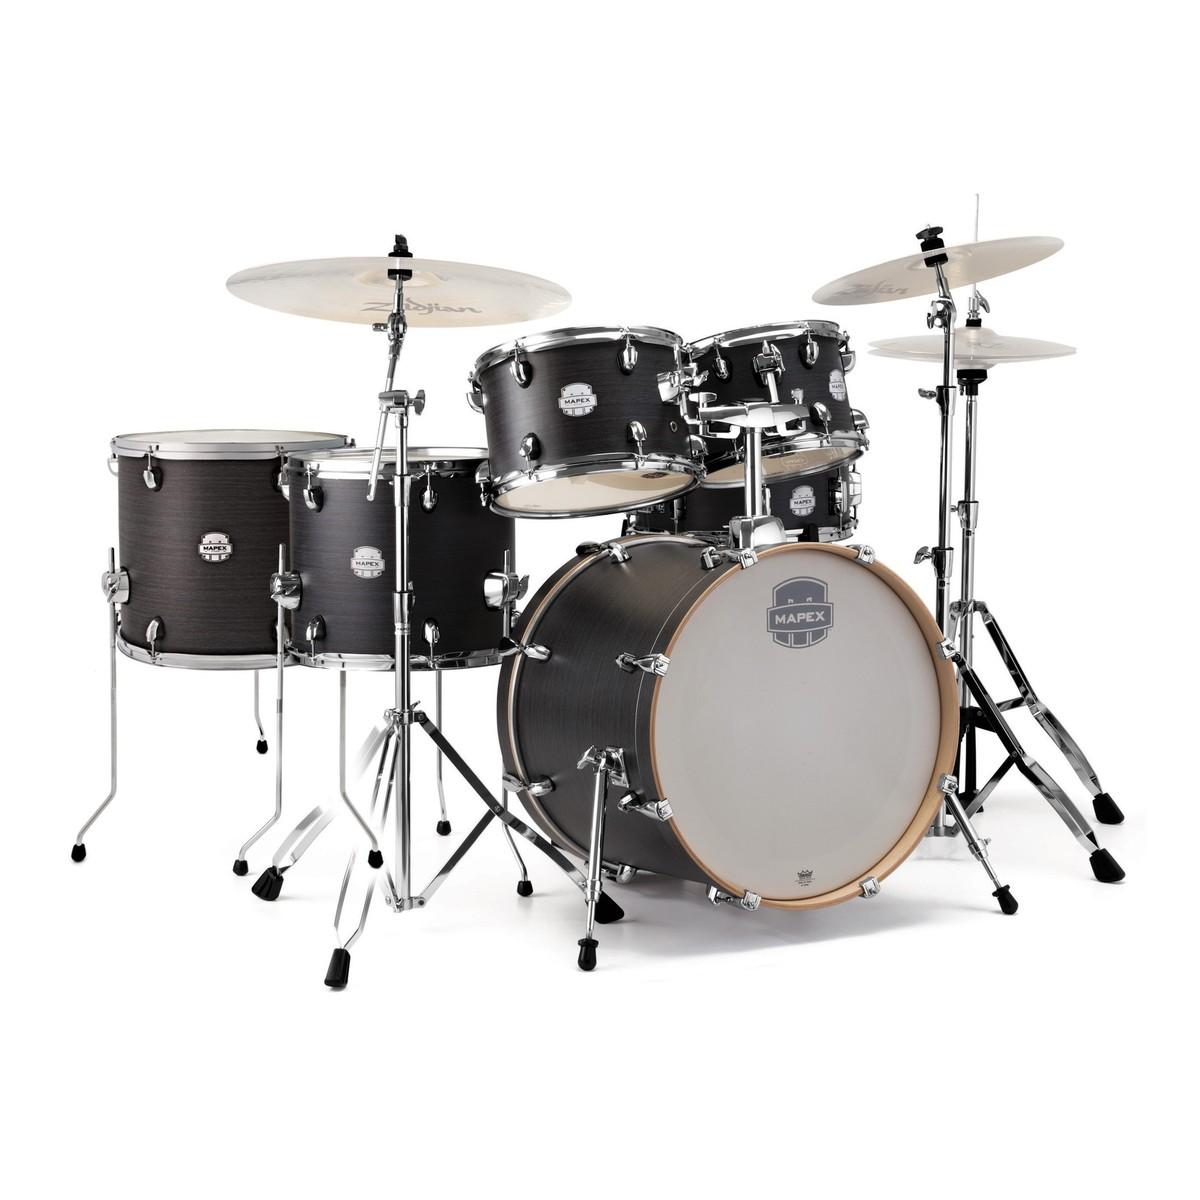 mapex storm 22 39 39 rock fusion drum kit w free floor tom ebony blue at. Black Bedroom Furniture Sets. Home Design Ideas